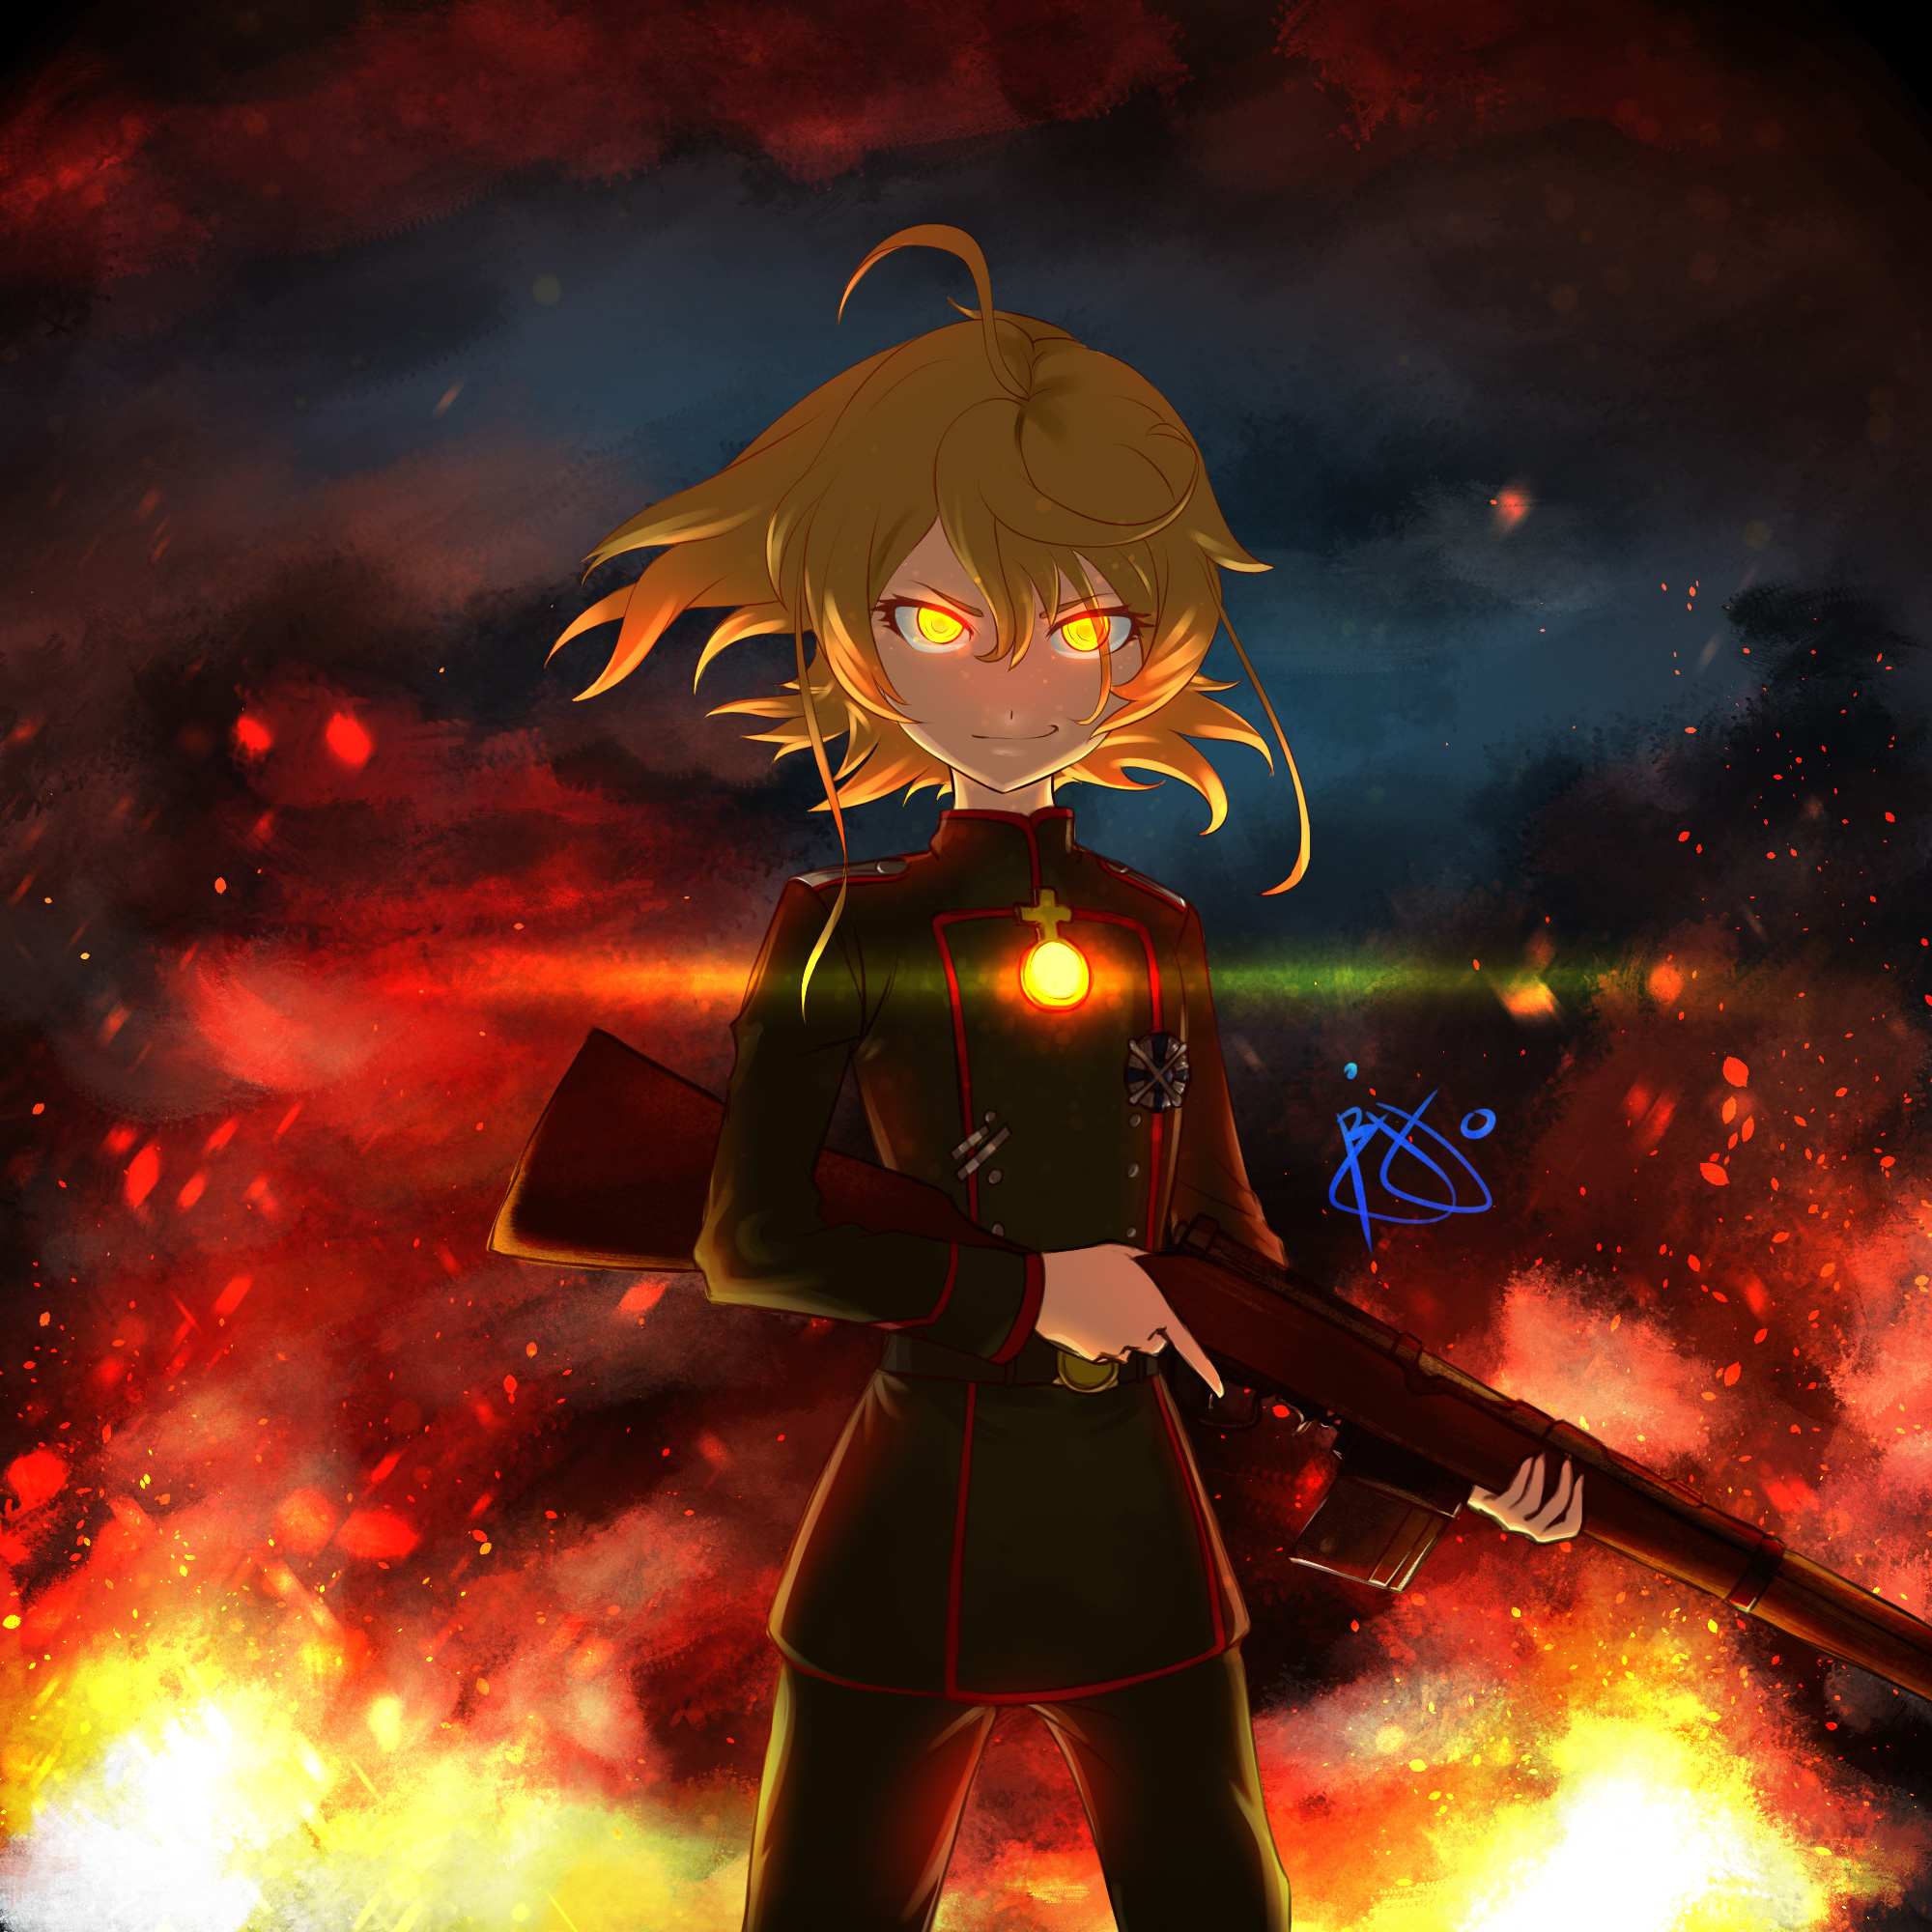 Youjo Senki, HD Anime, 4k Wallpapers, Images, Backgrounds